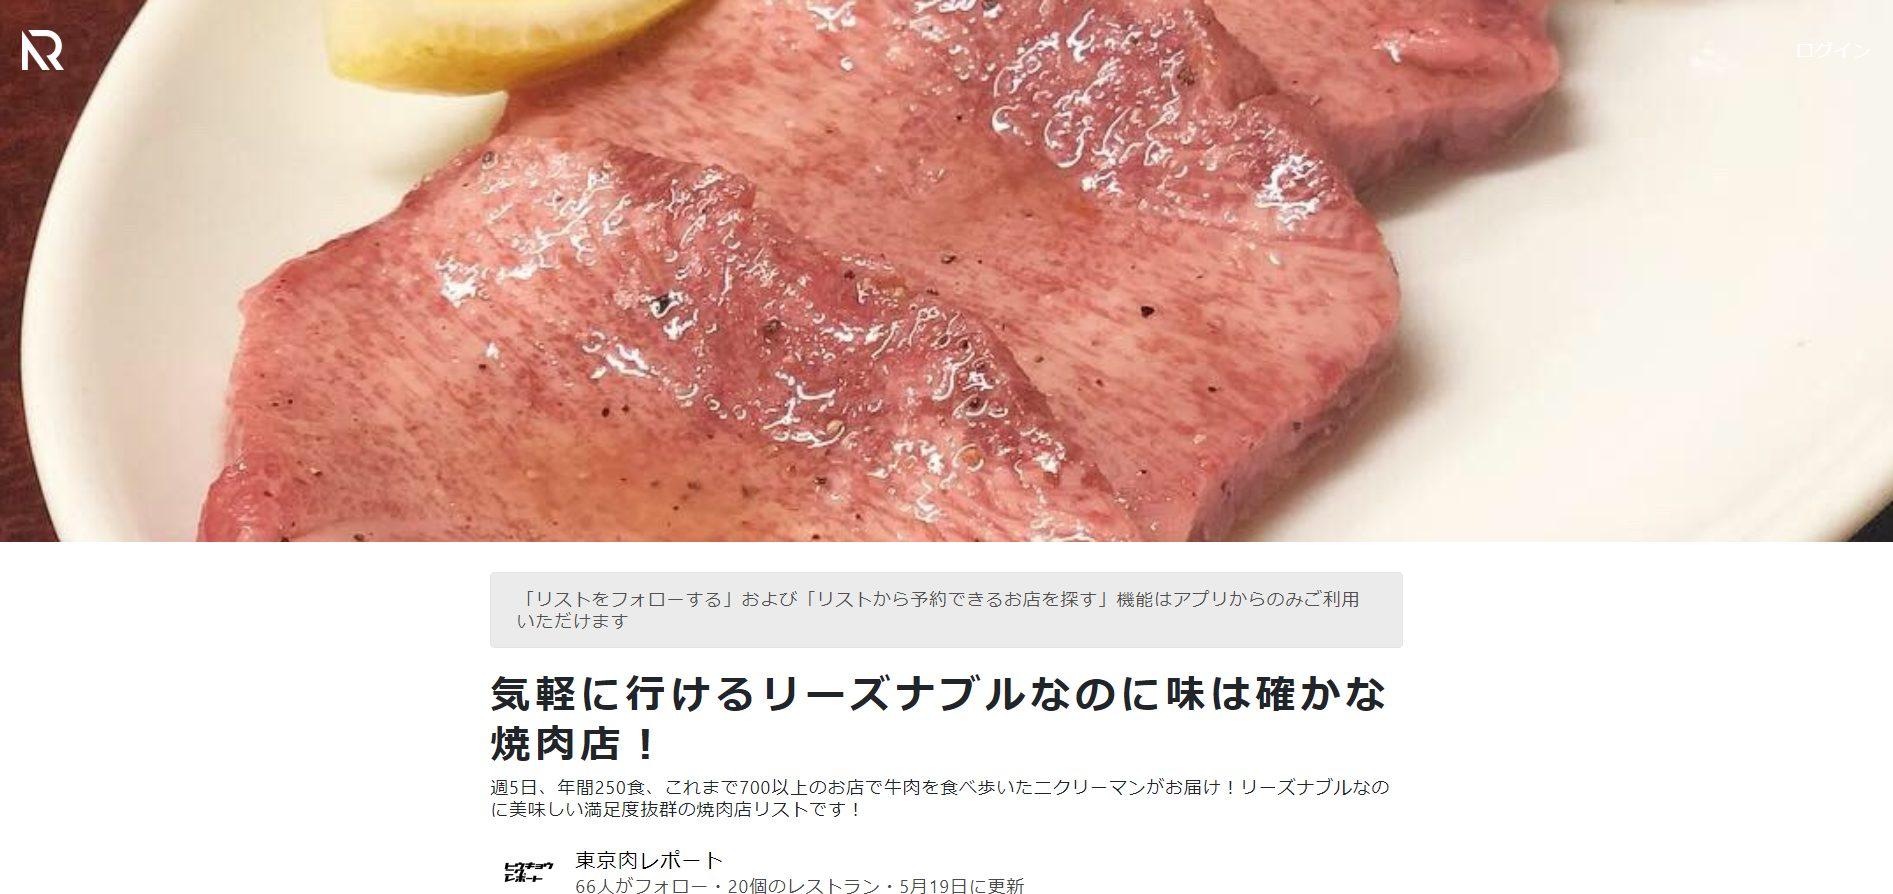 tokyo-niku-report-column